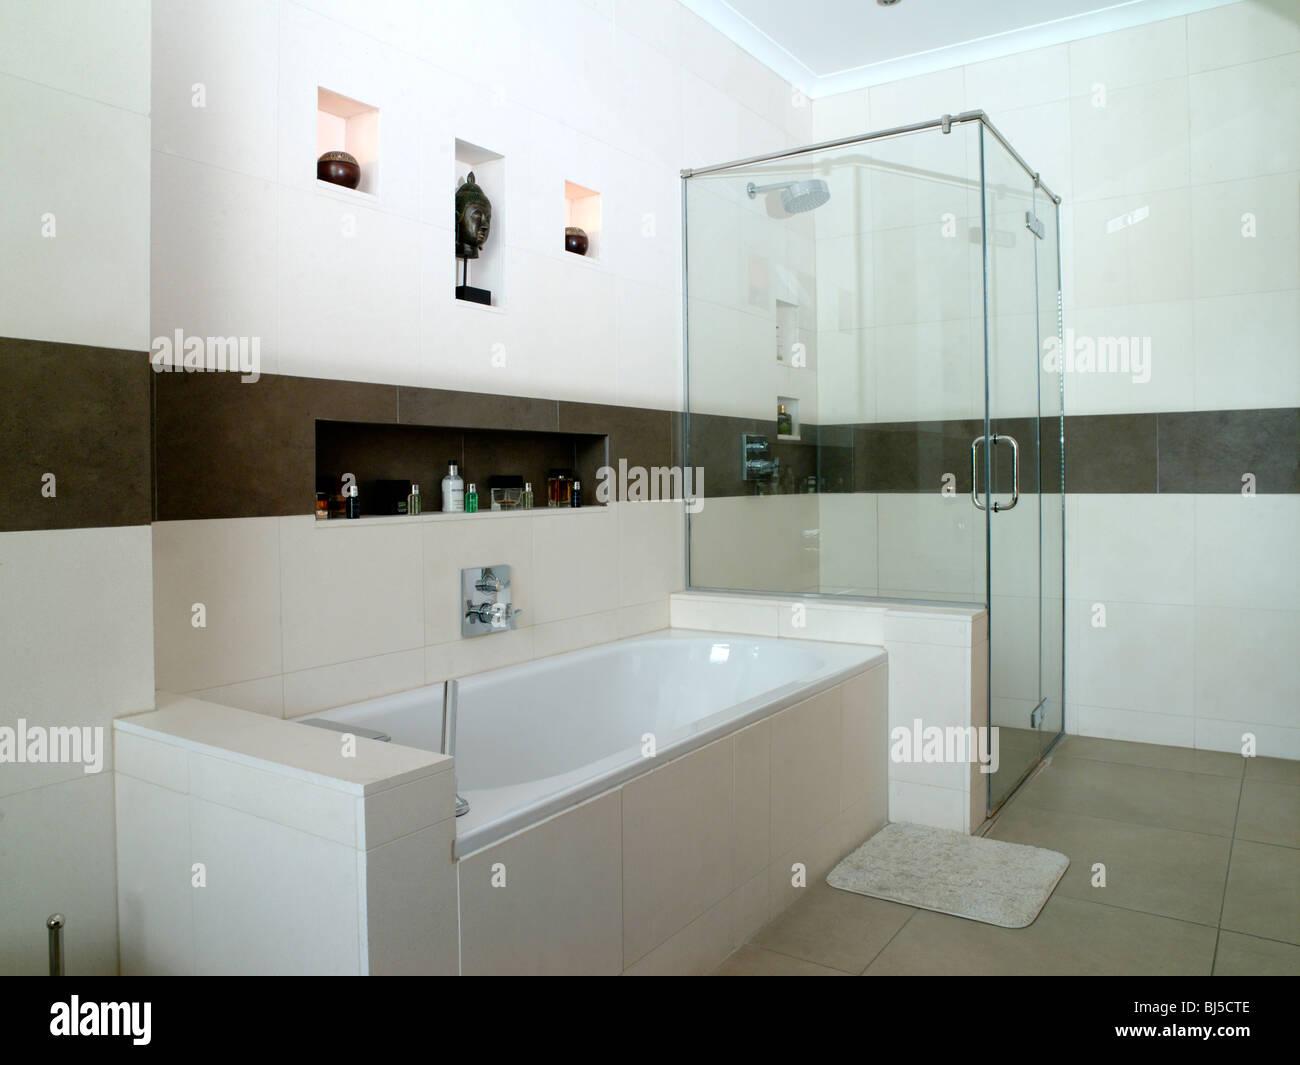 Modernos ba os alicatados en blanco y azulejos de color - Alicatados banos modernos ...